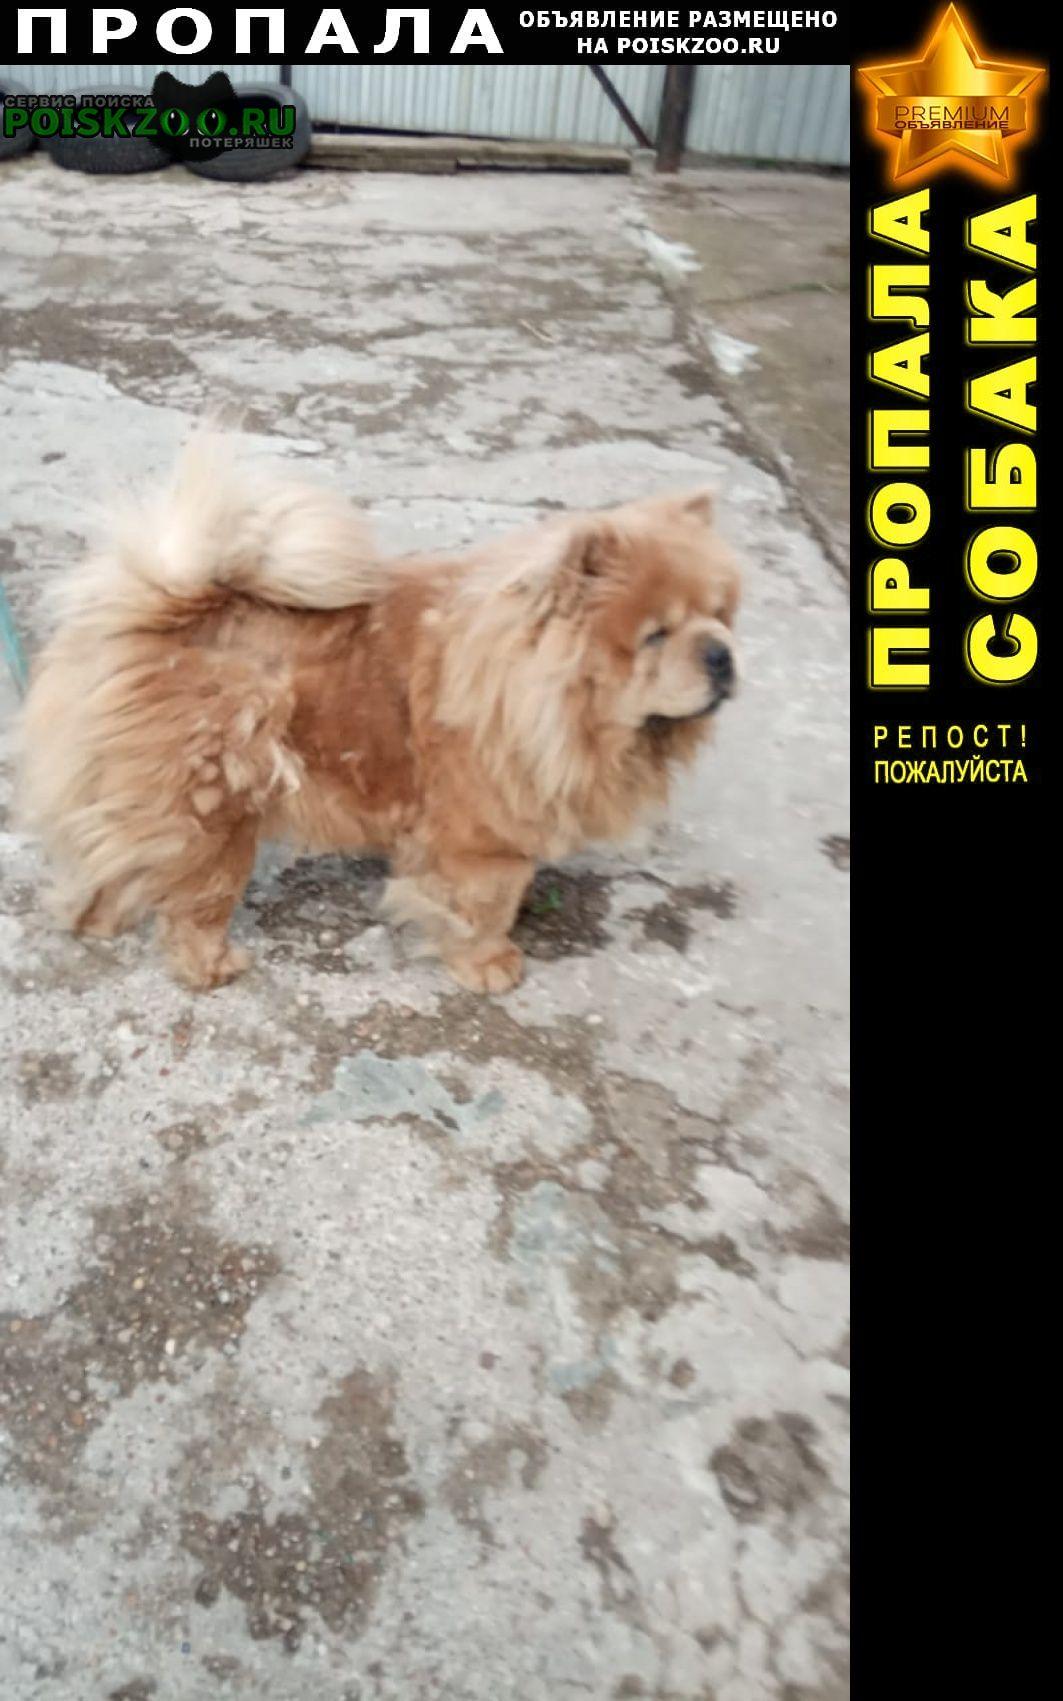 Пропала собака Уфа